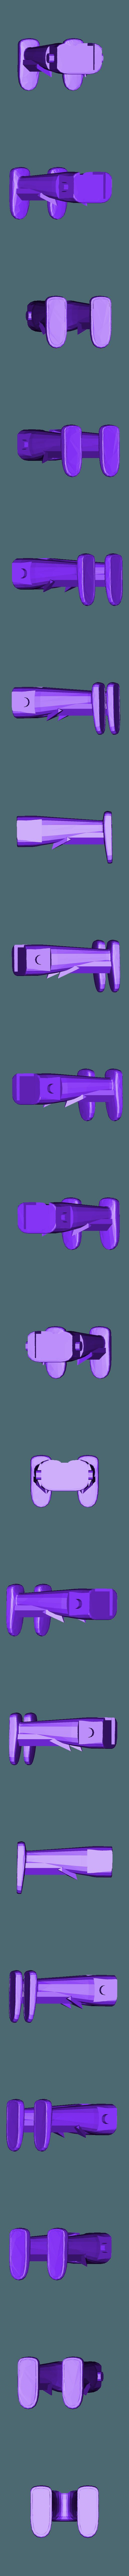 playmobil_desmontable_darth_vader.stl Download free STL file Darth Vader Playmobil • 3D printable object, madsoul666